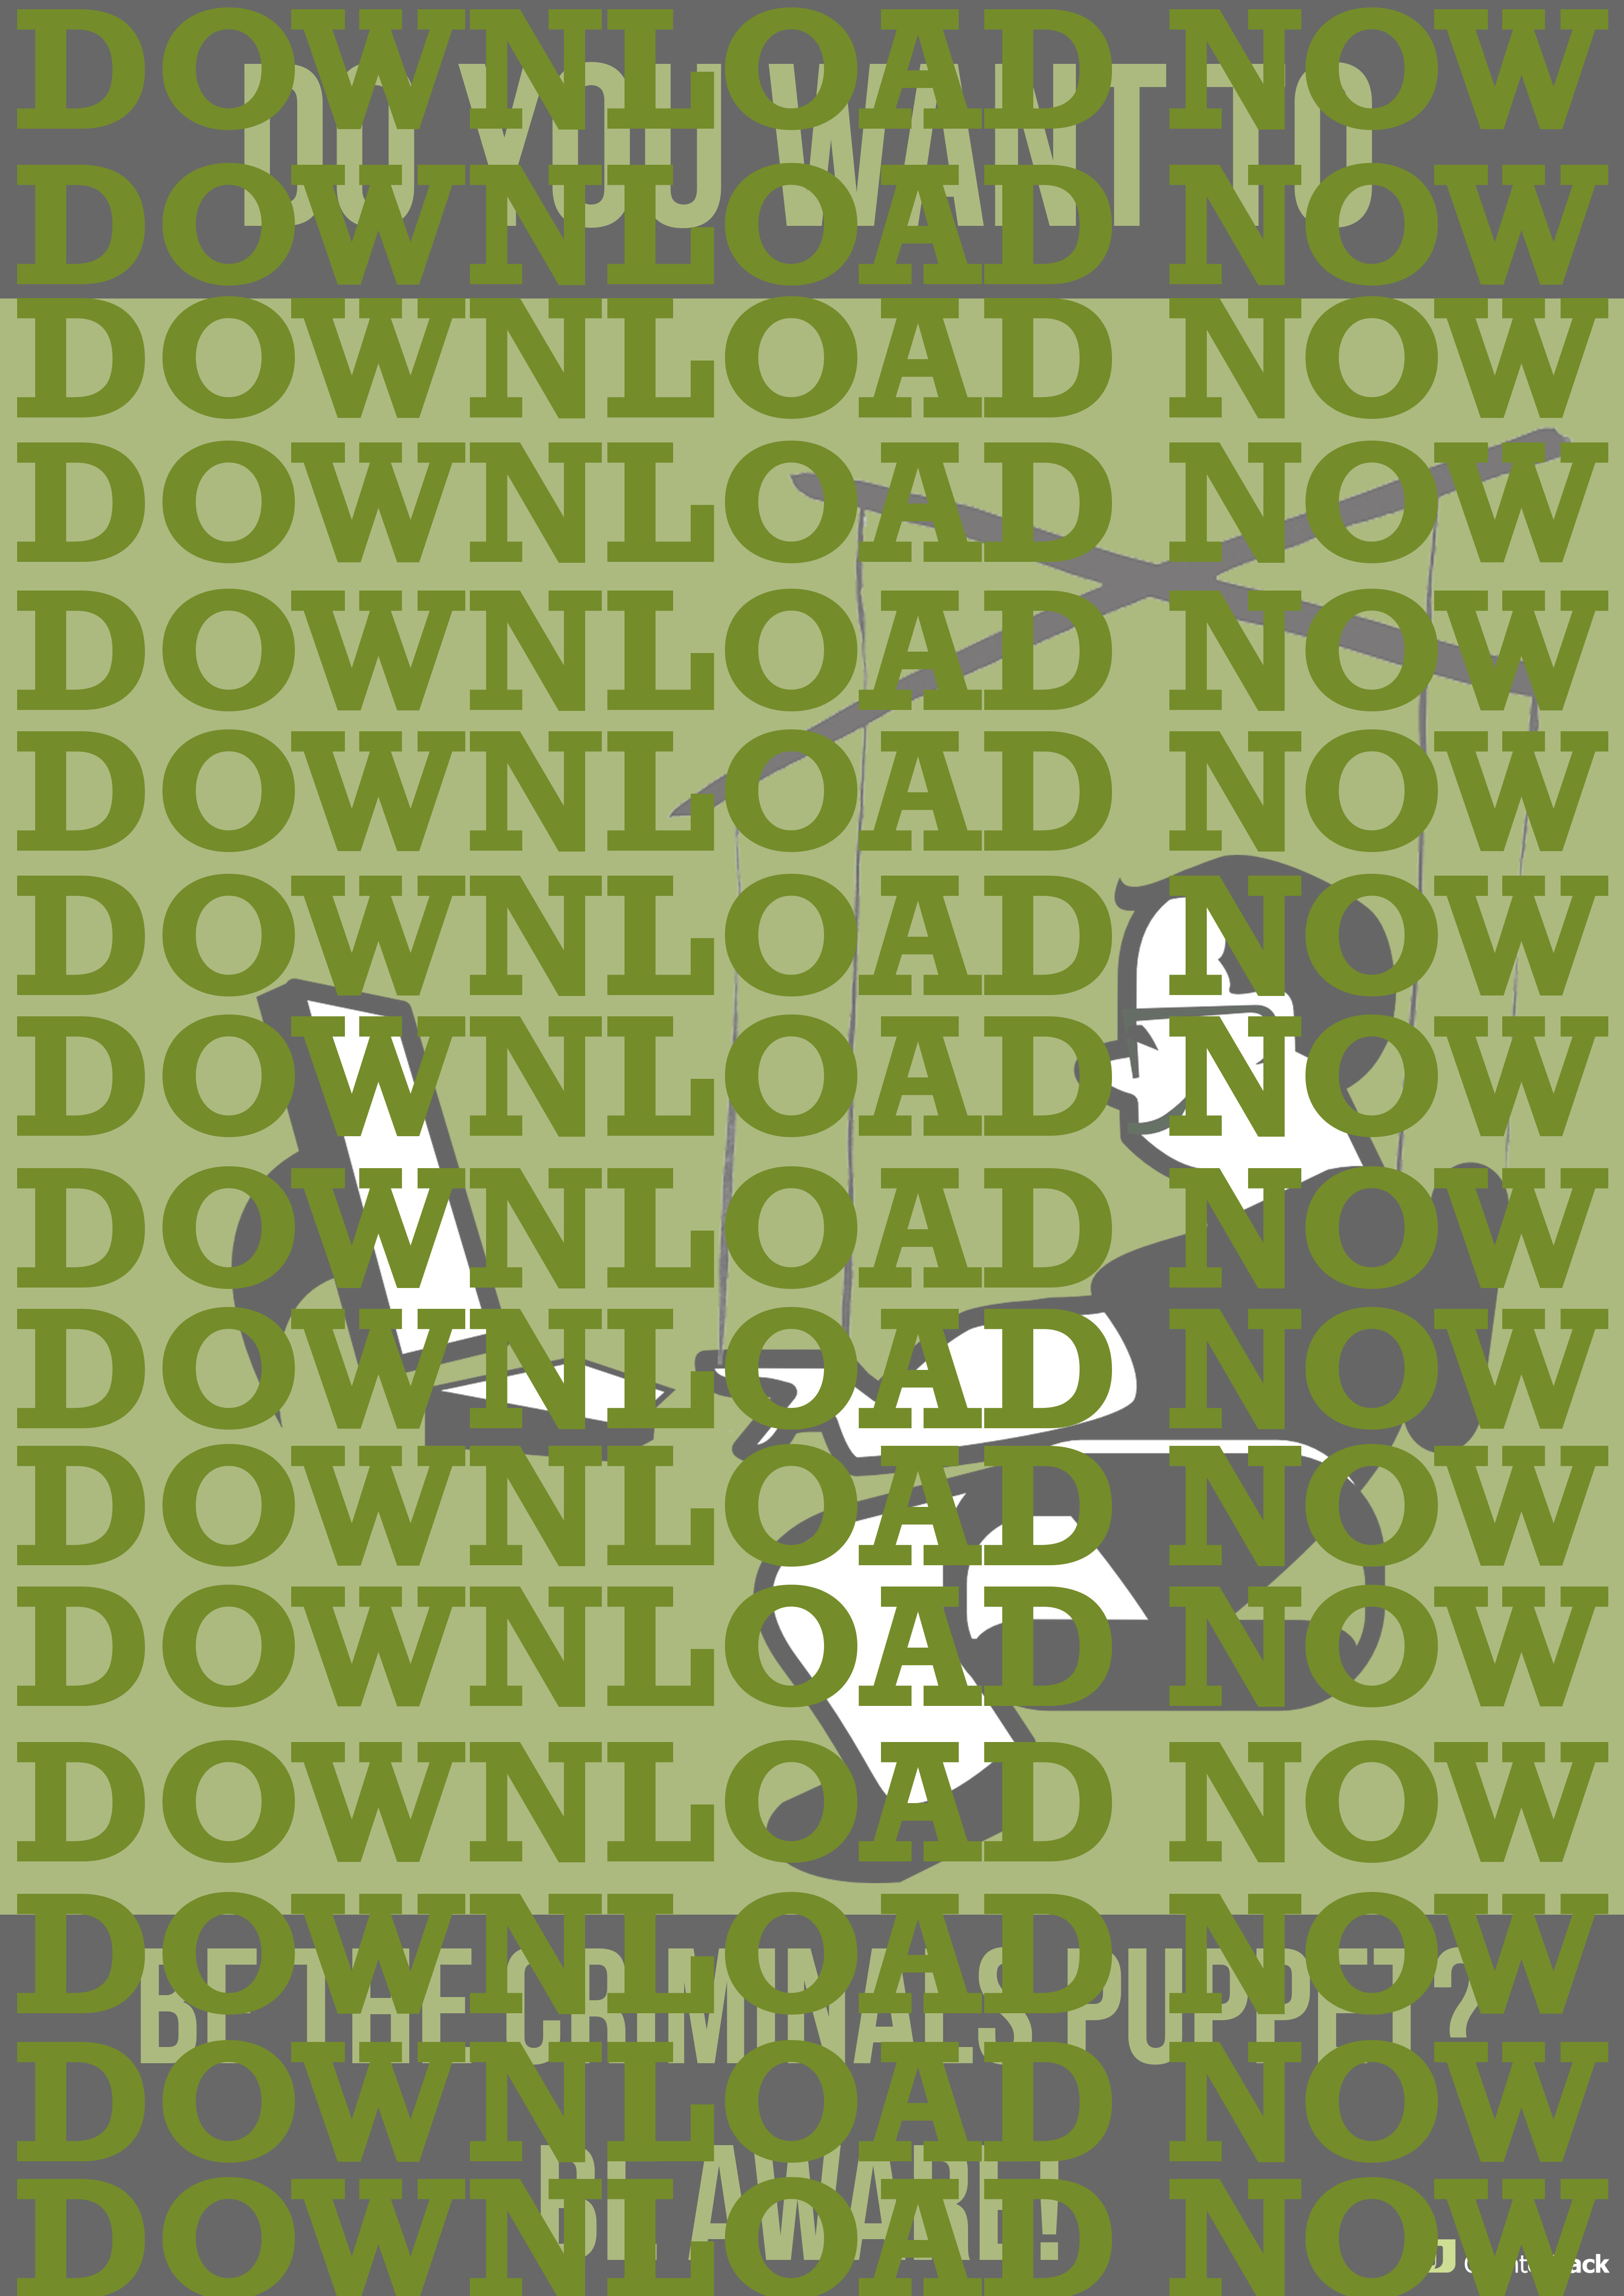 Social Engineering Poster Download